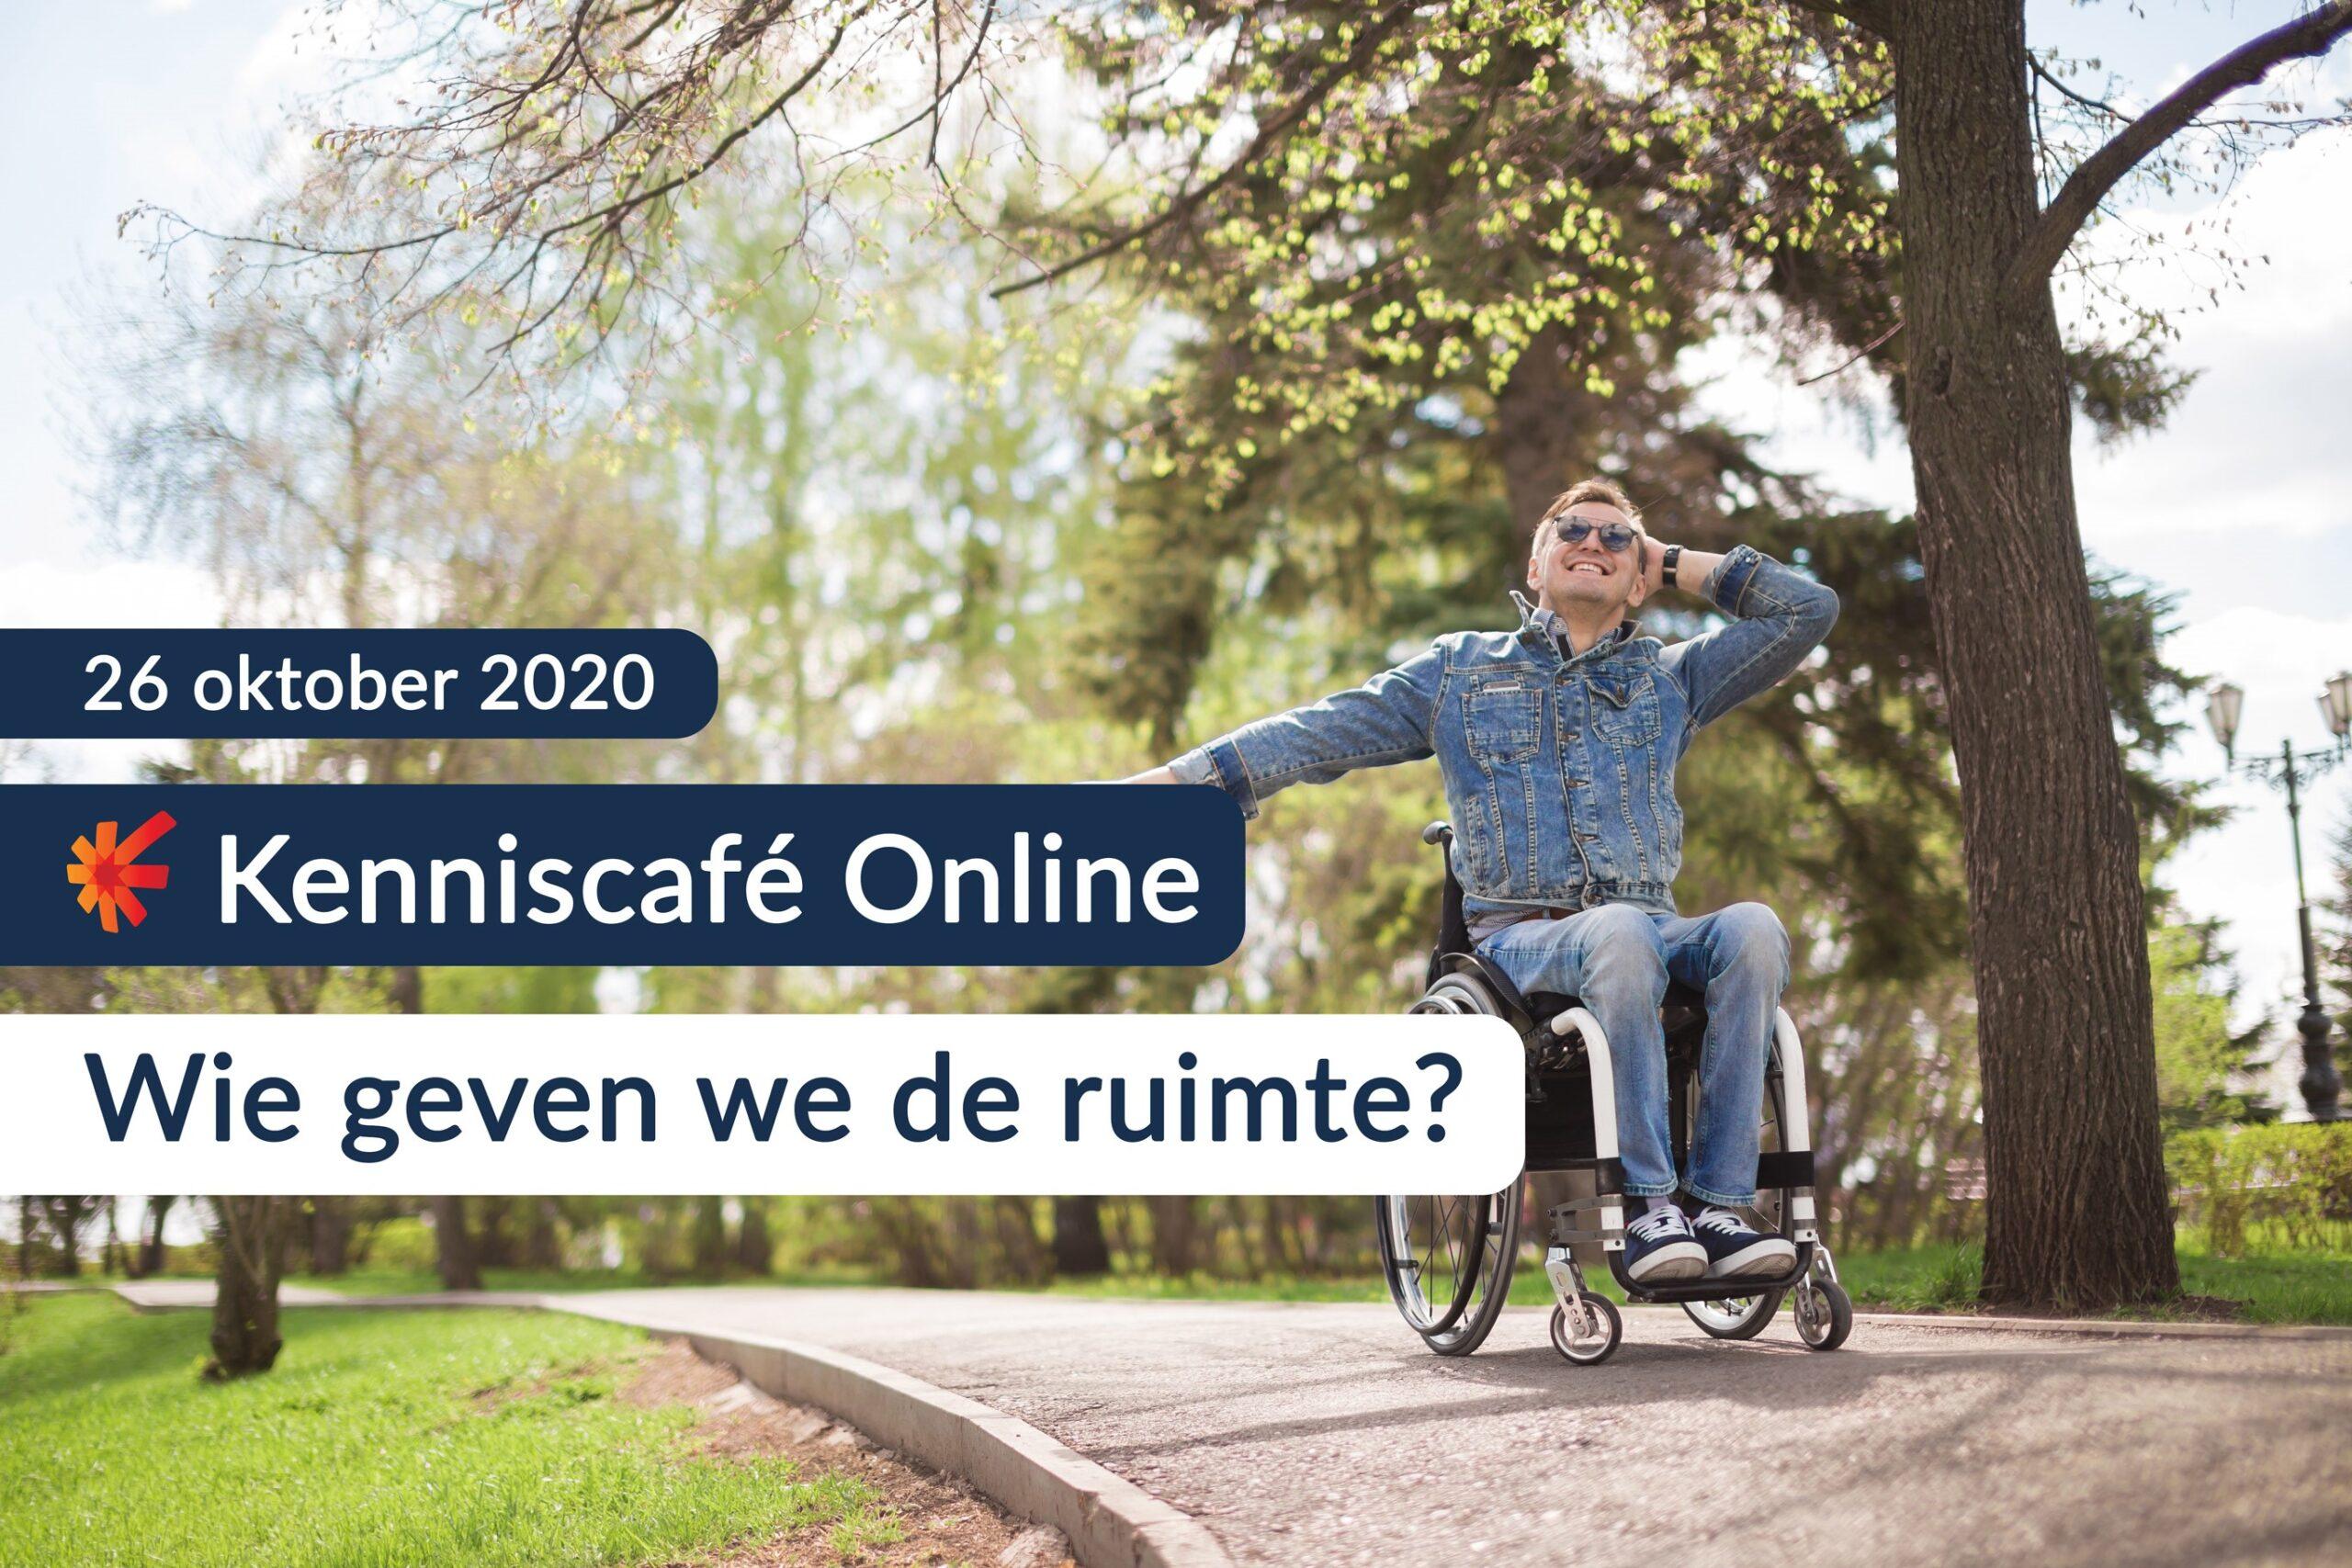 Kenniscafé Online